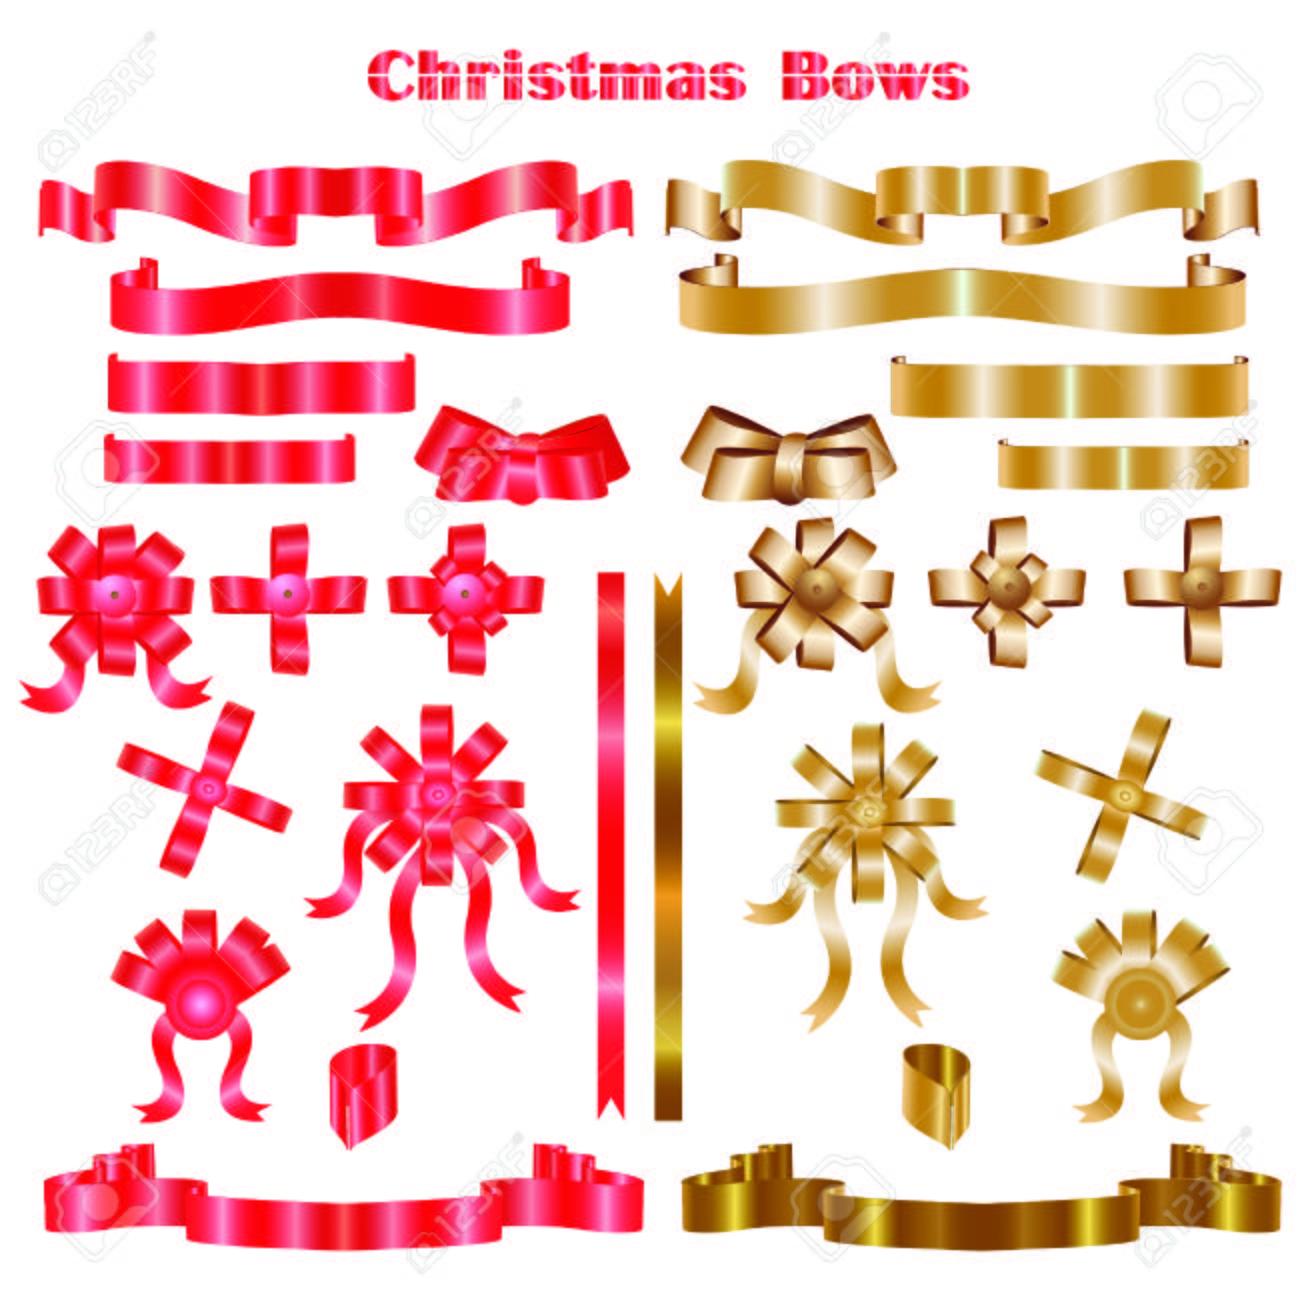 Christmas Bows Vector Illustration Royalty Free Cliparts Vectors